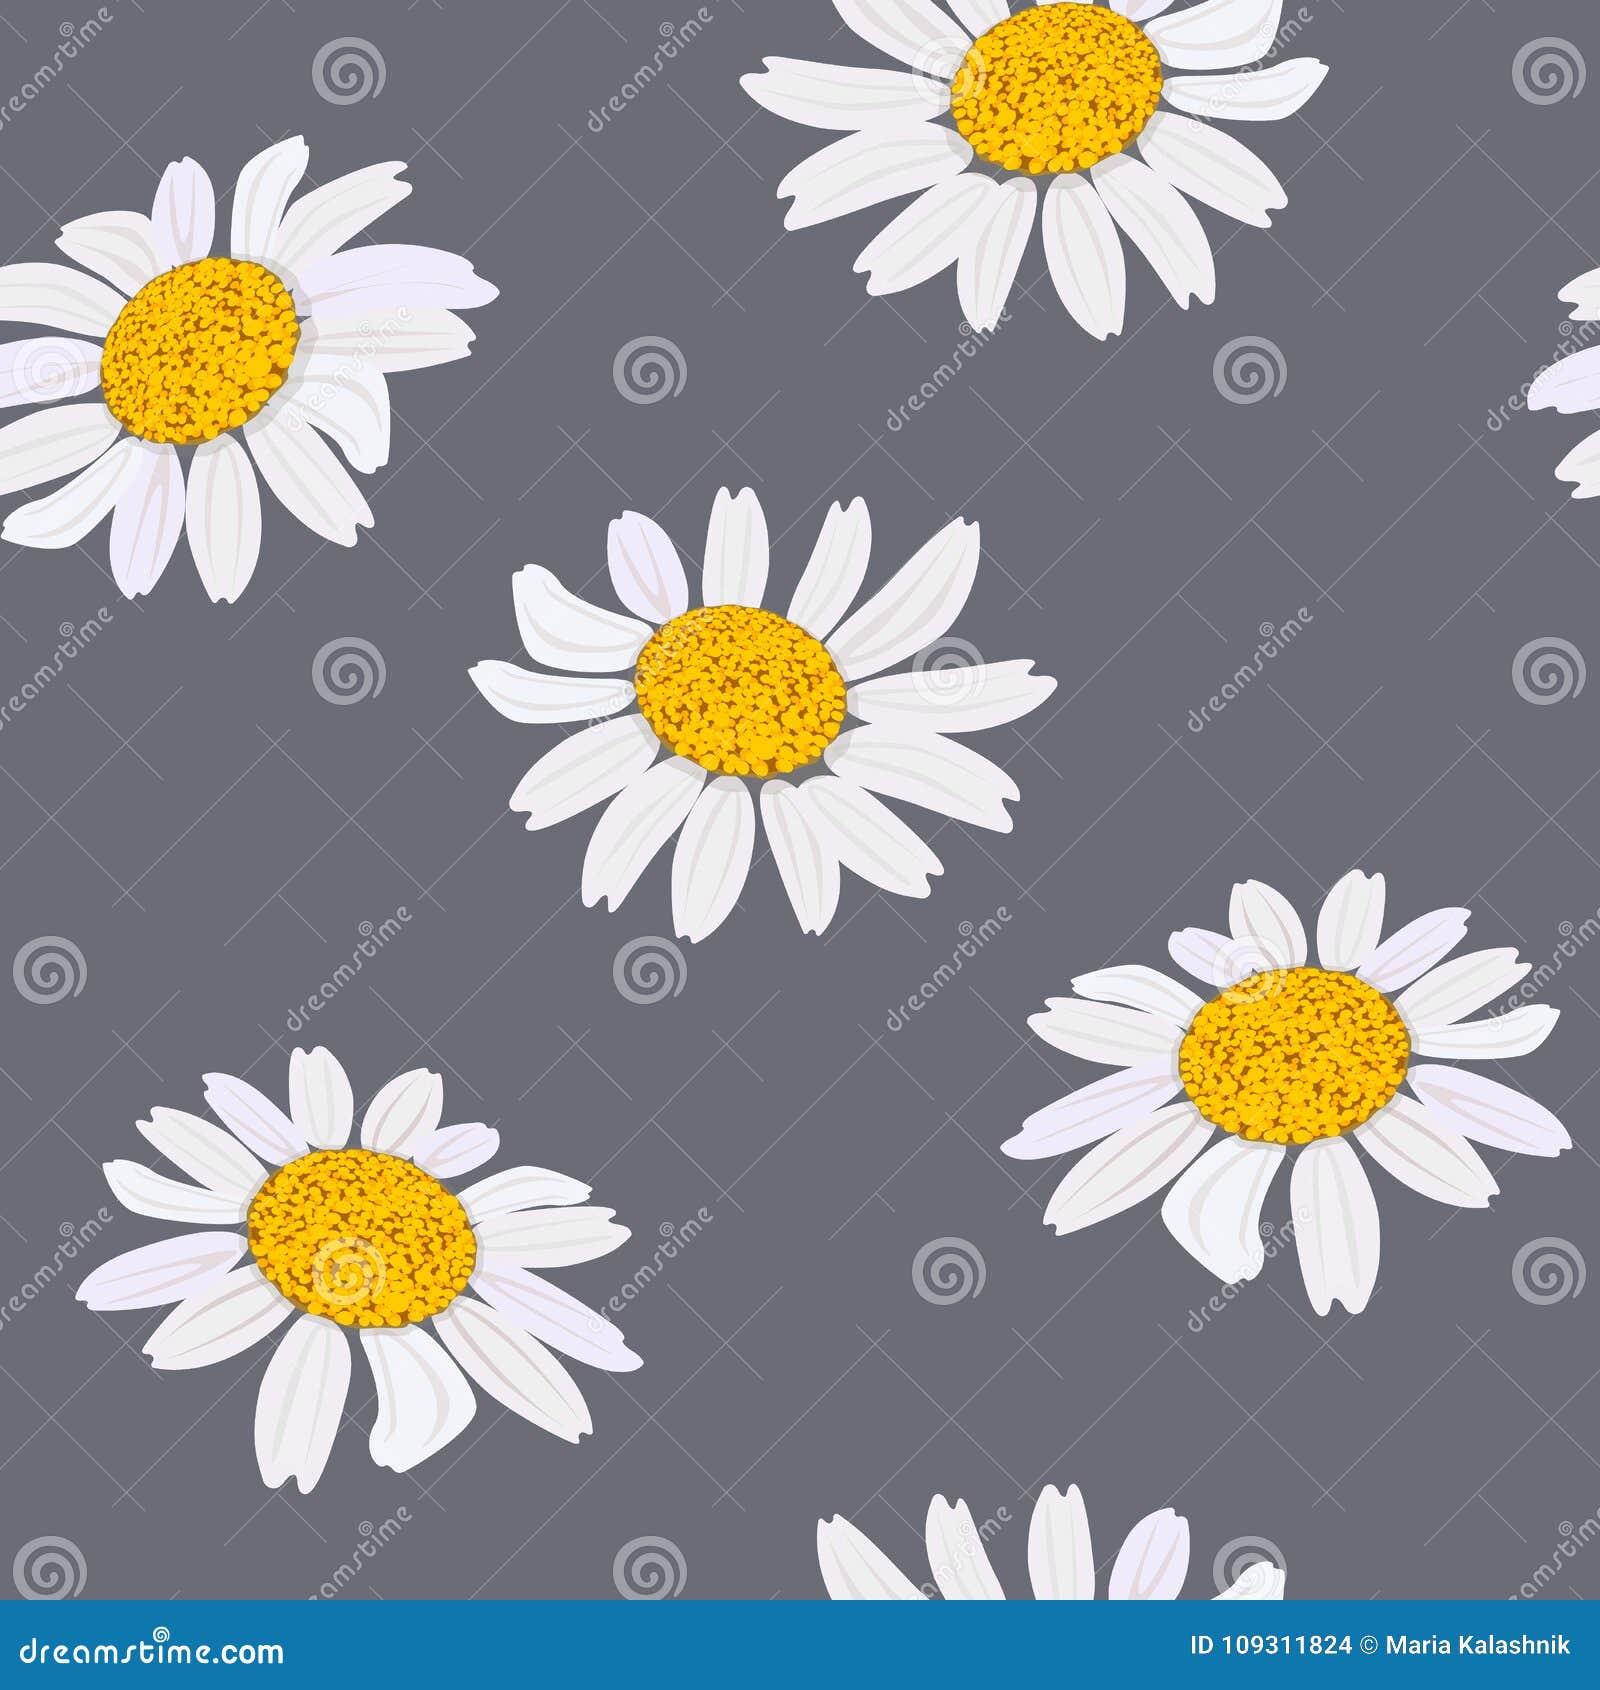 Daisy Flowers Heads Seamless Pattern Vector Illustration Purple